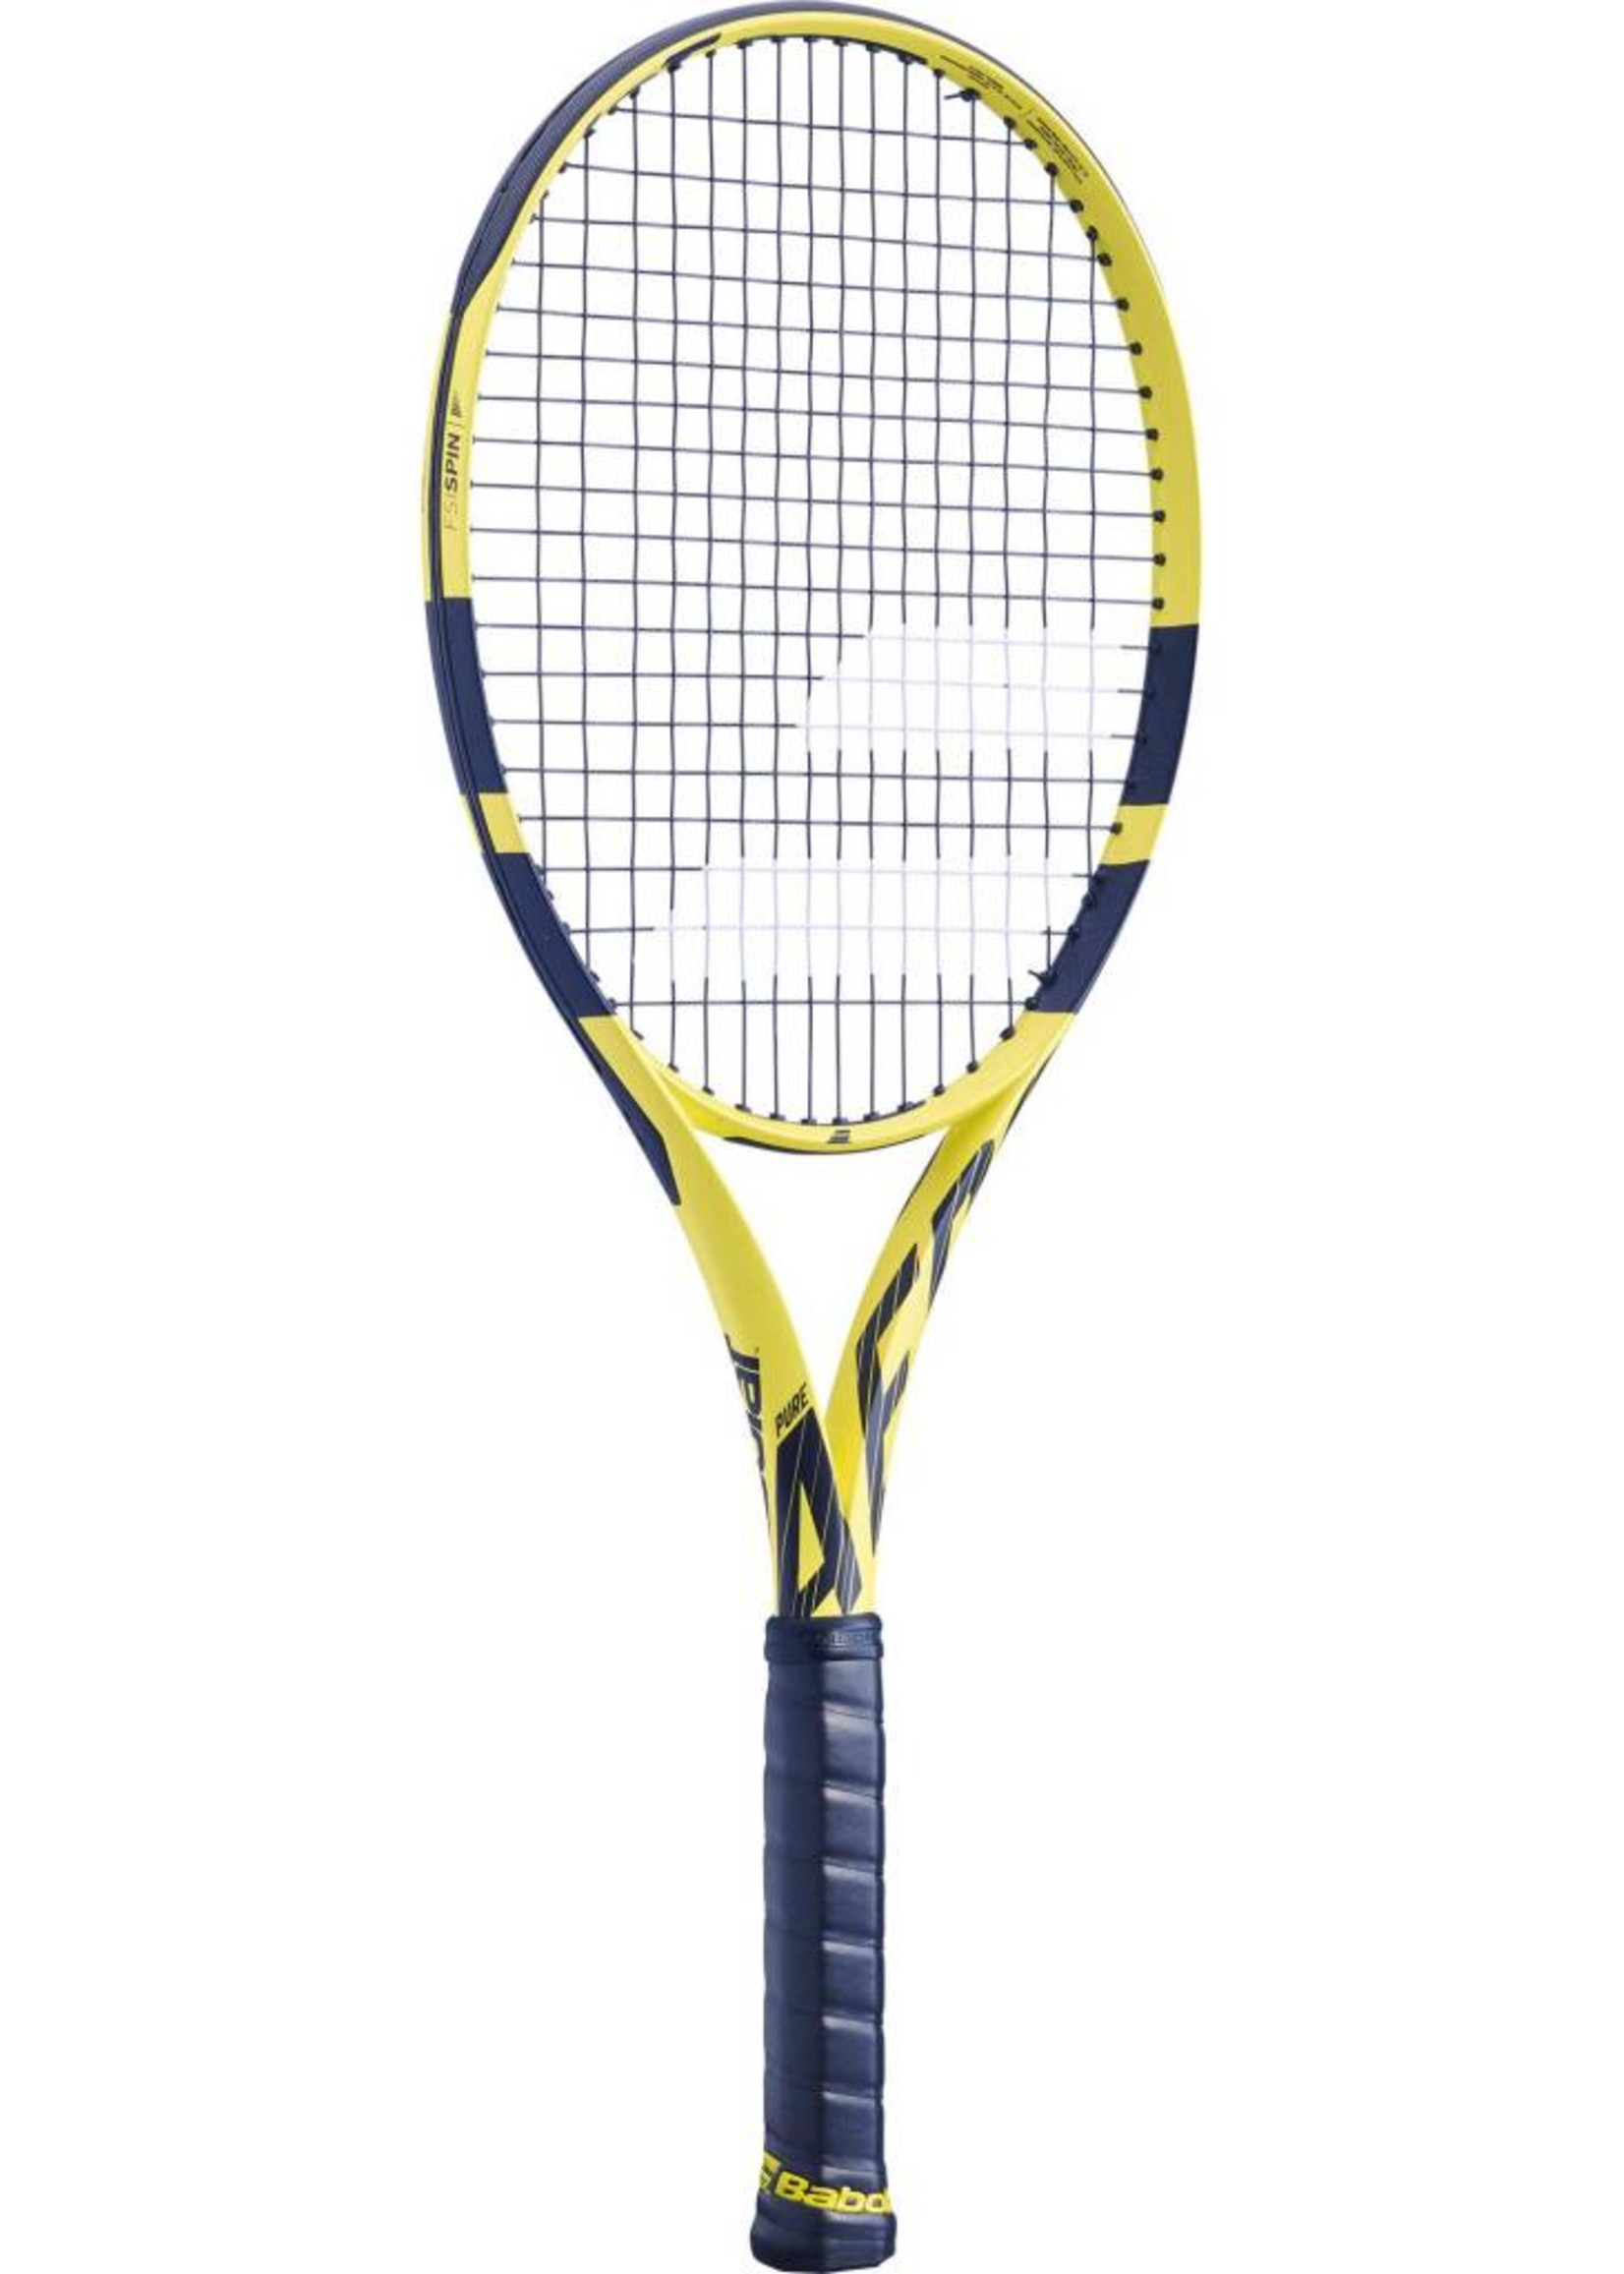 "Babolat Babolat Pure Aero Junior 26"" Tennis Racket (2019)"